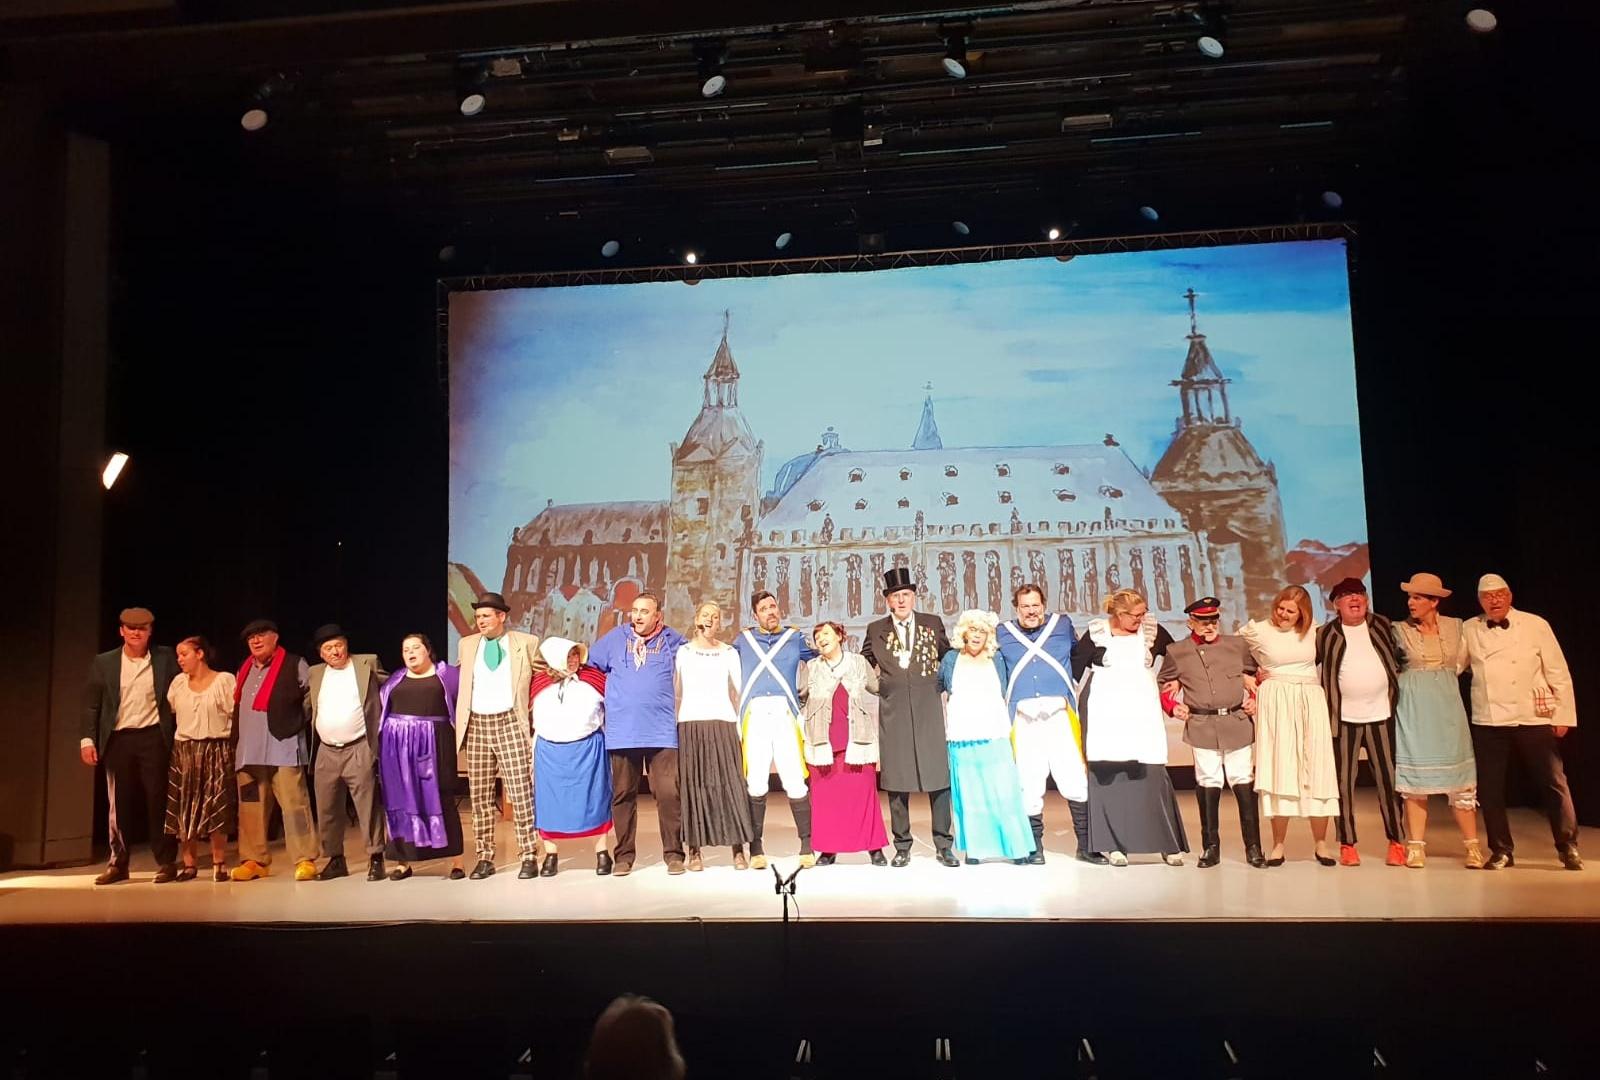 Permalink to: Das Musical Teil II